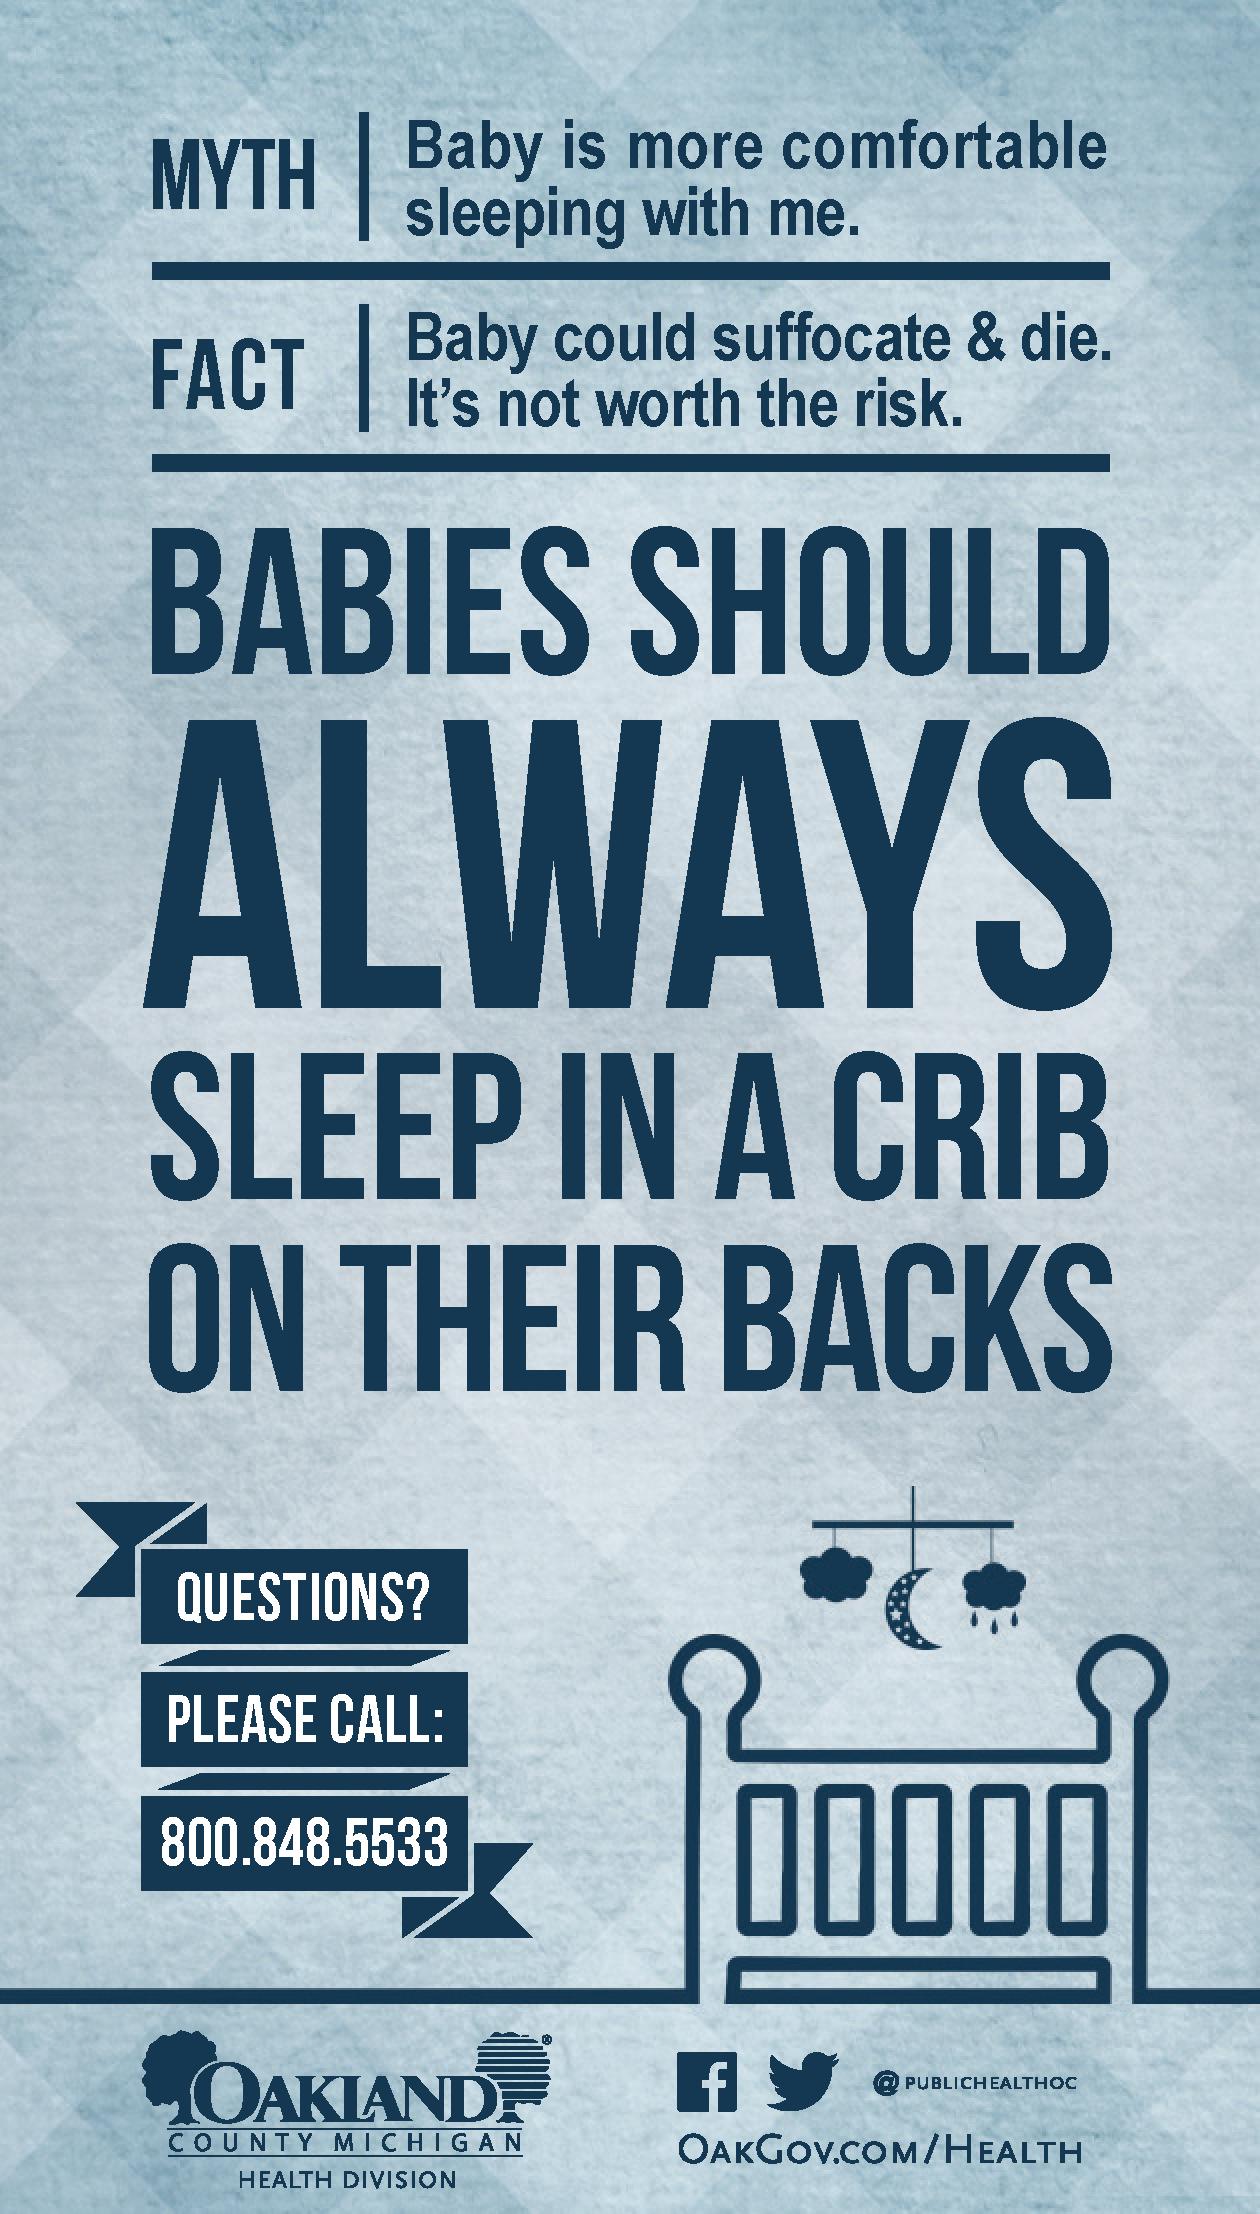 Babies should always sleep in a crib on their backs